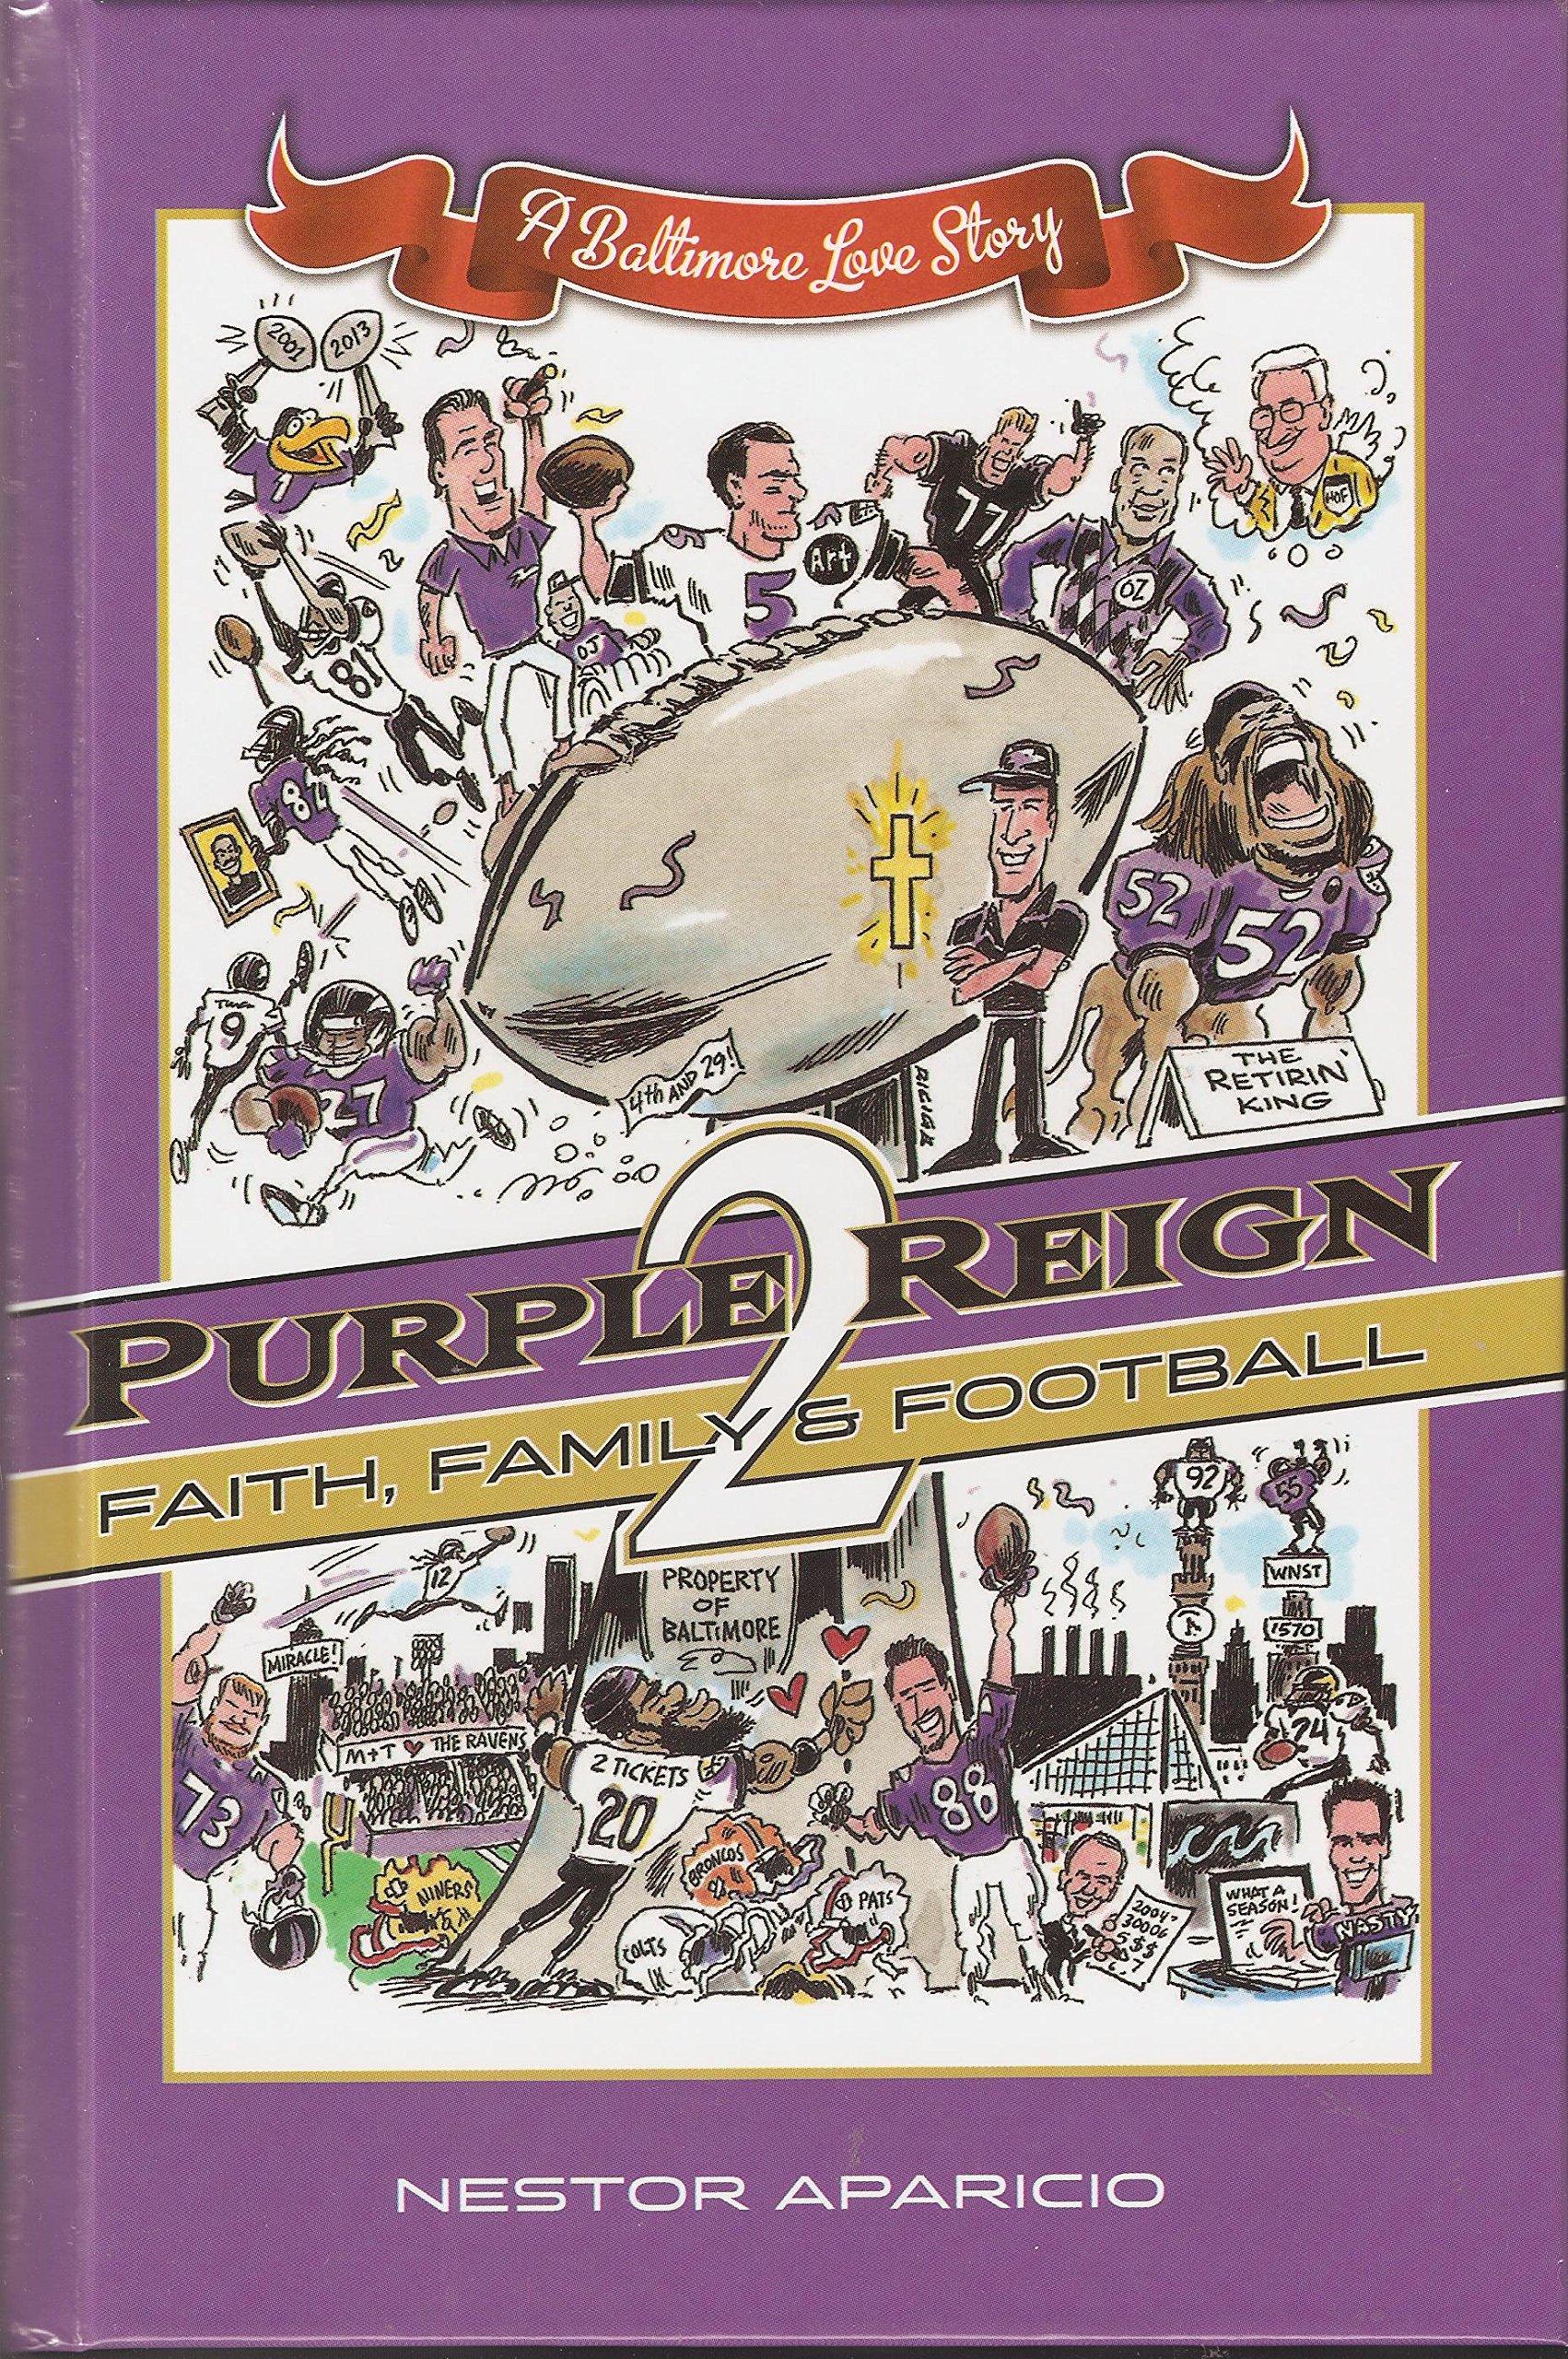 Purple Reign 2: Faith, Family & Football - A Baltimore Love Story